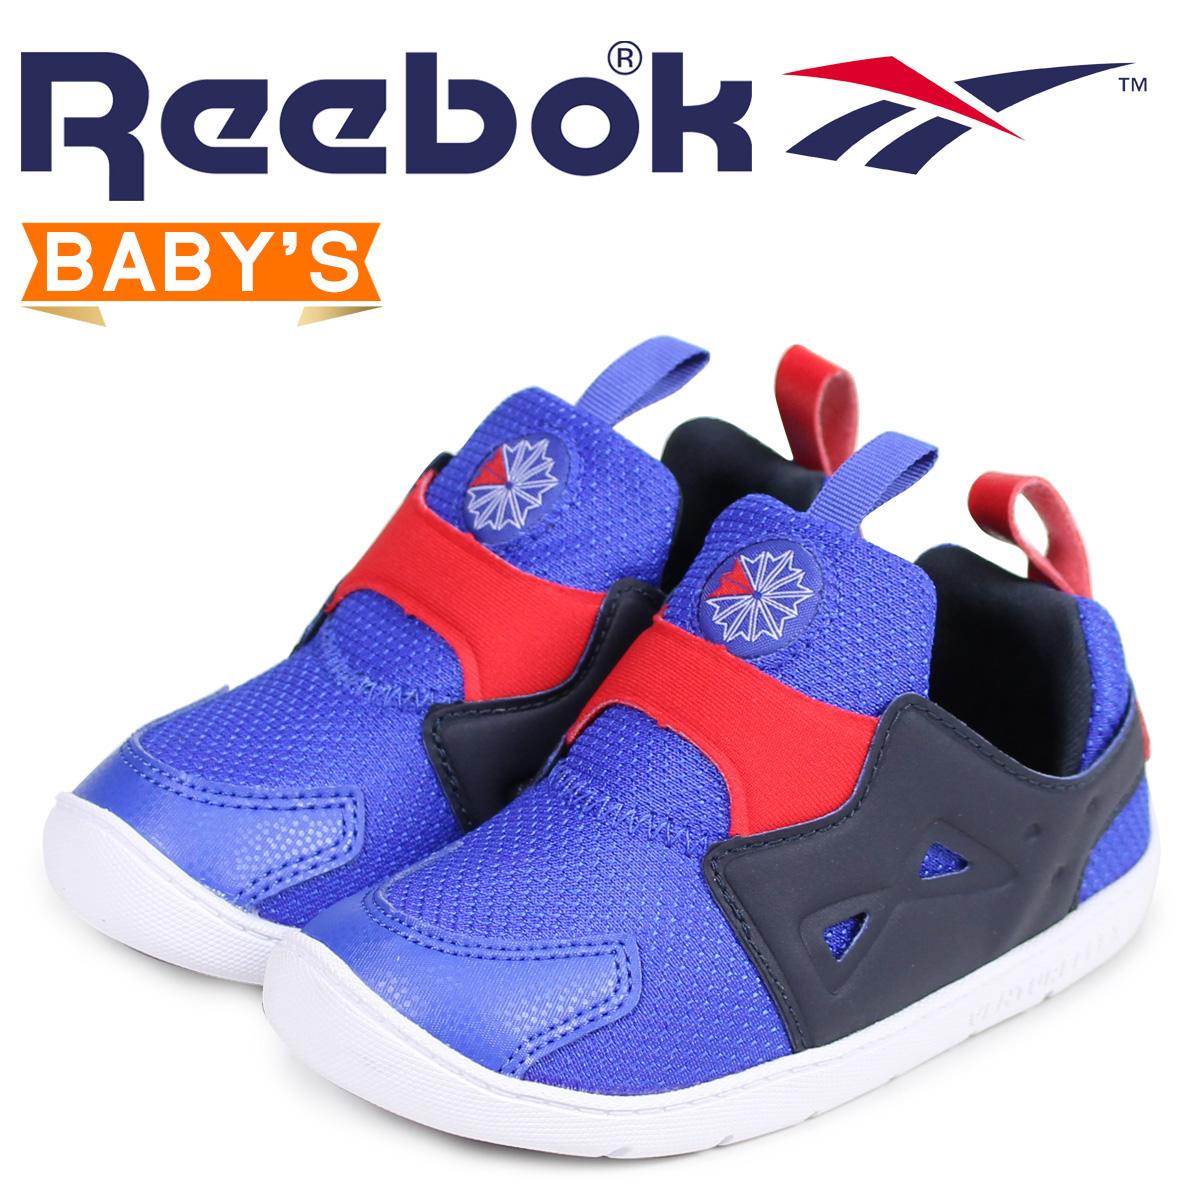 Reebok venture flextime baby sneakers slip-ons Reebok VENTURE FLEX 2.0  CM9144 blue  load planned Shinnyu load in reservation product 1 13  containing  de00c6207